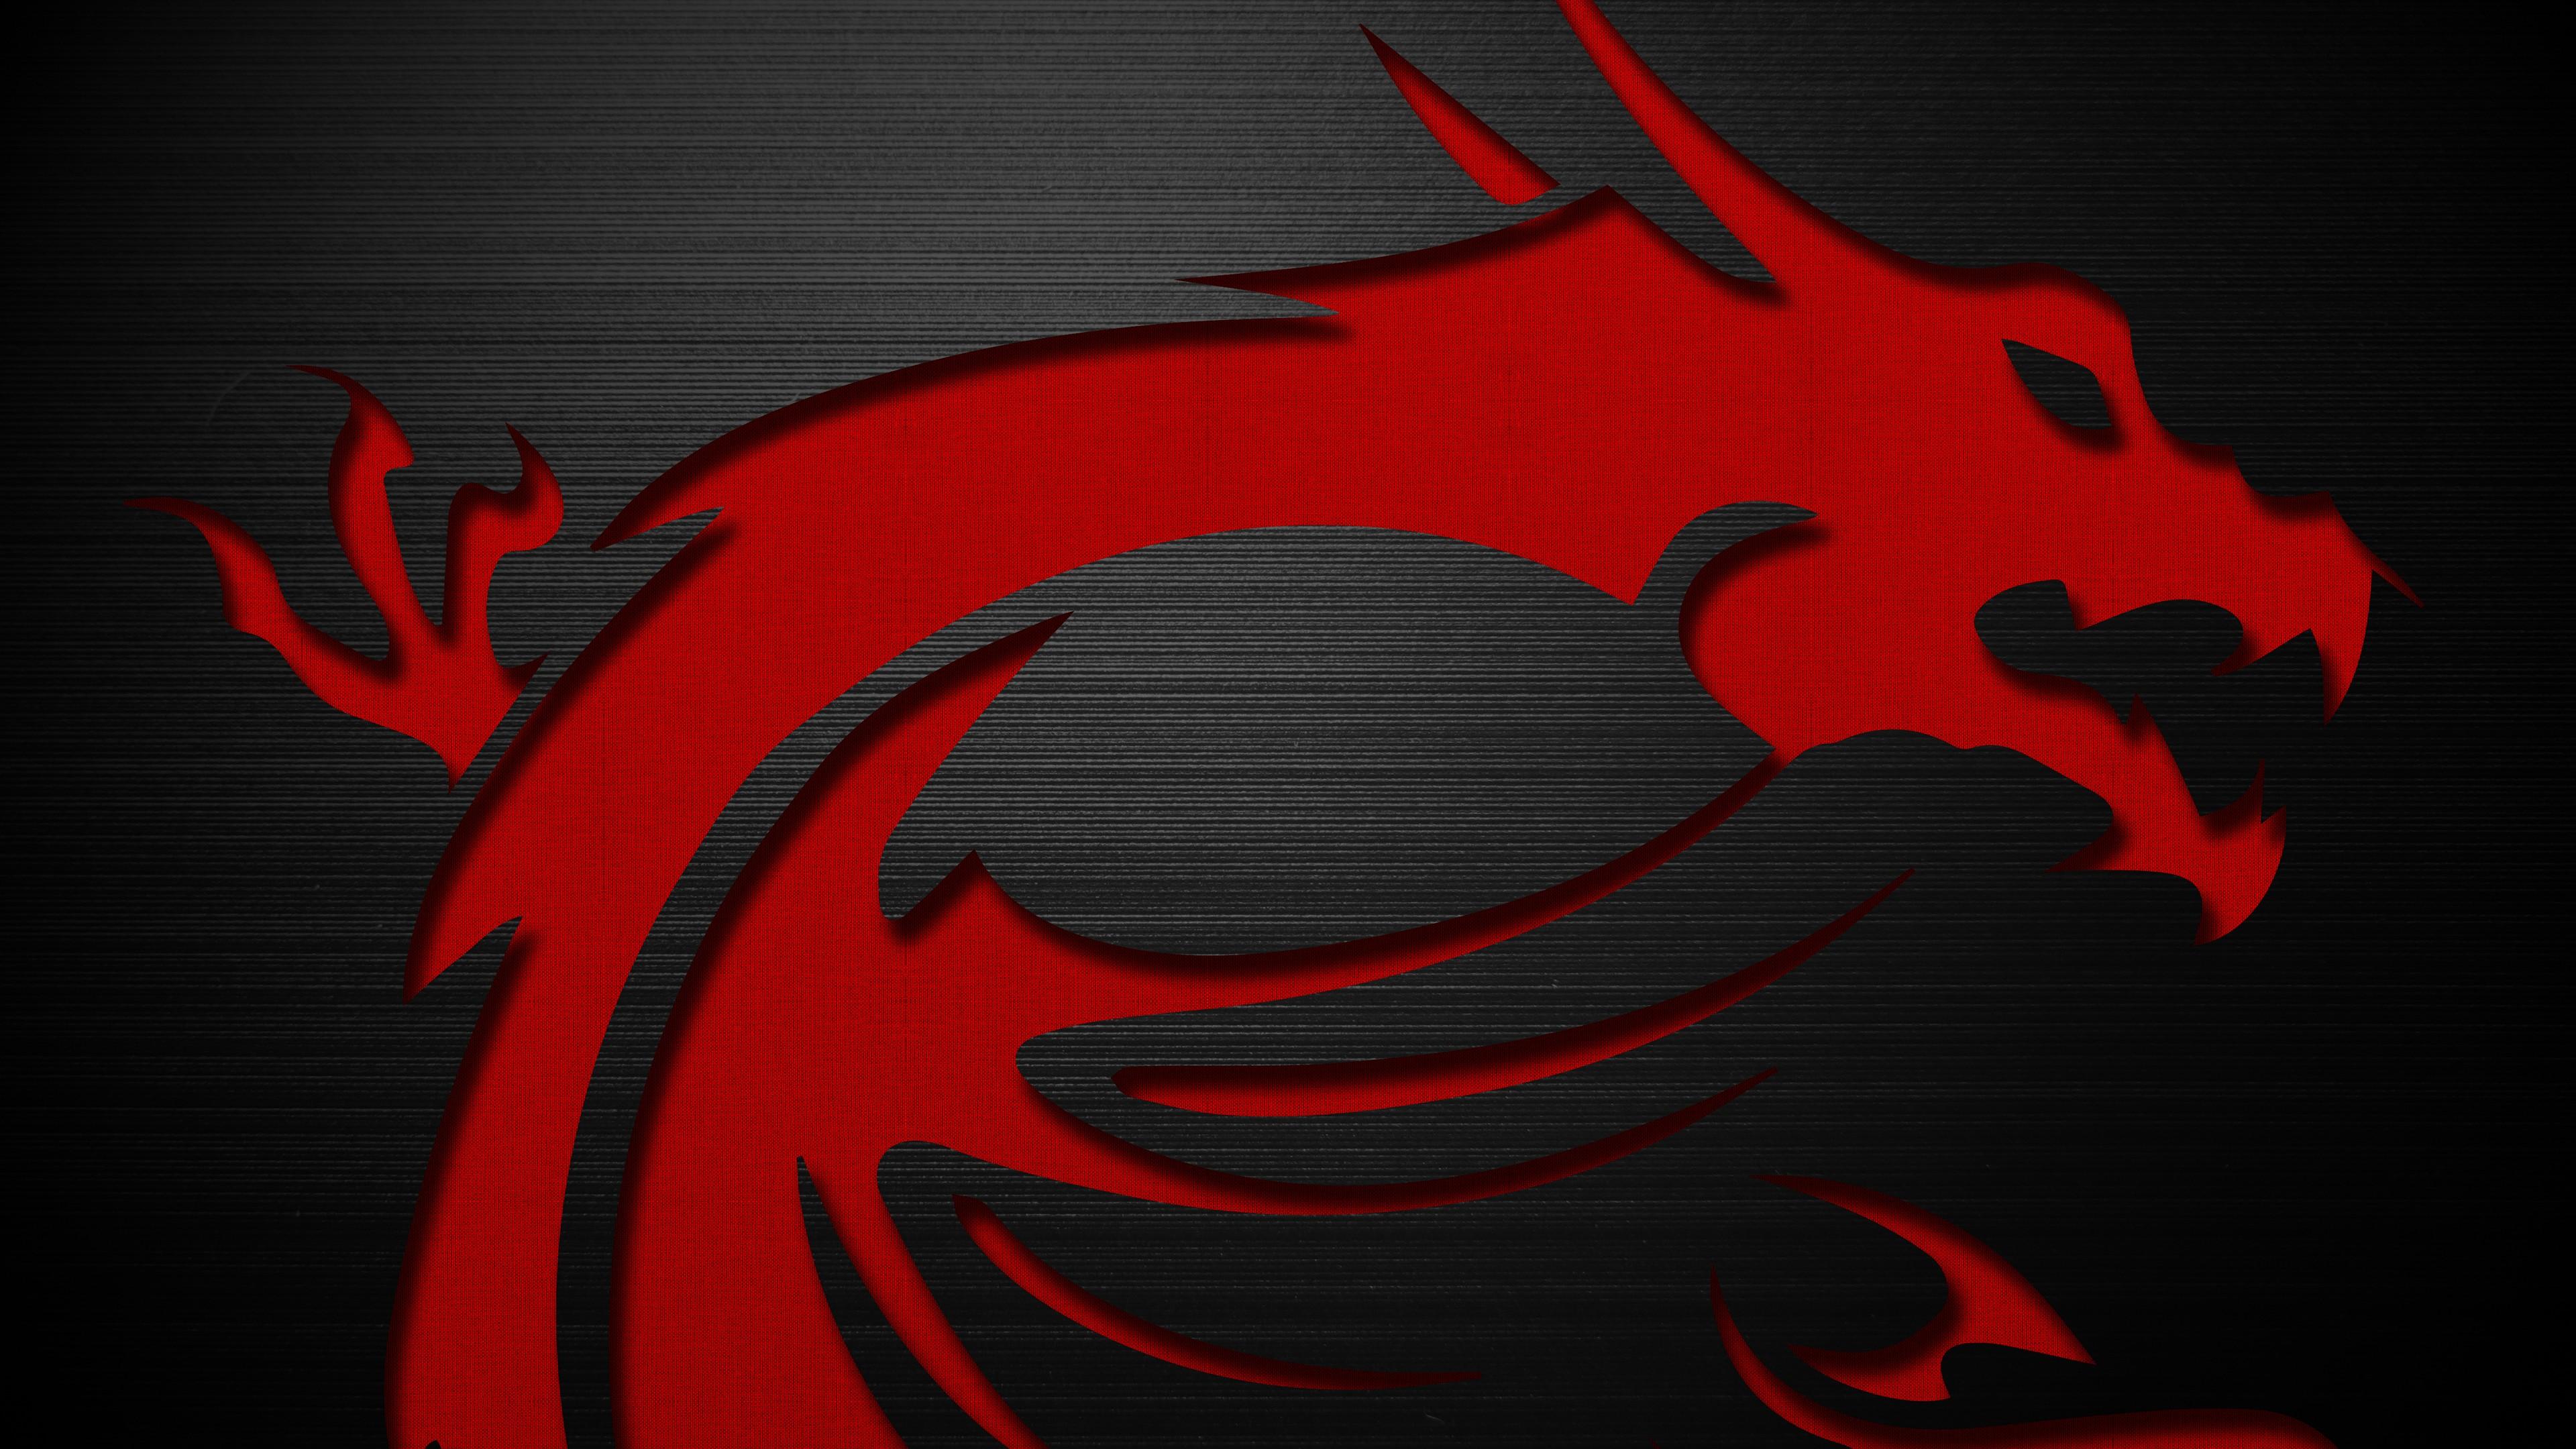 Top Wallpaper Logo Dragon - illustration-red-logo-dragon-texture-technology-MSI-PC-gaming-hardware-ART-fictional-character-font-74659  Trends_22960.jpg